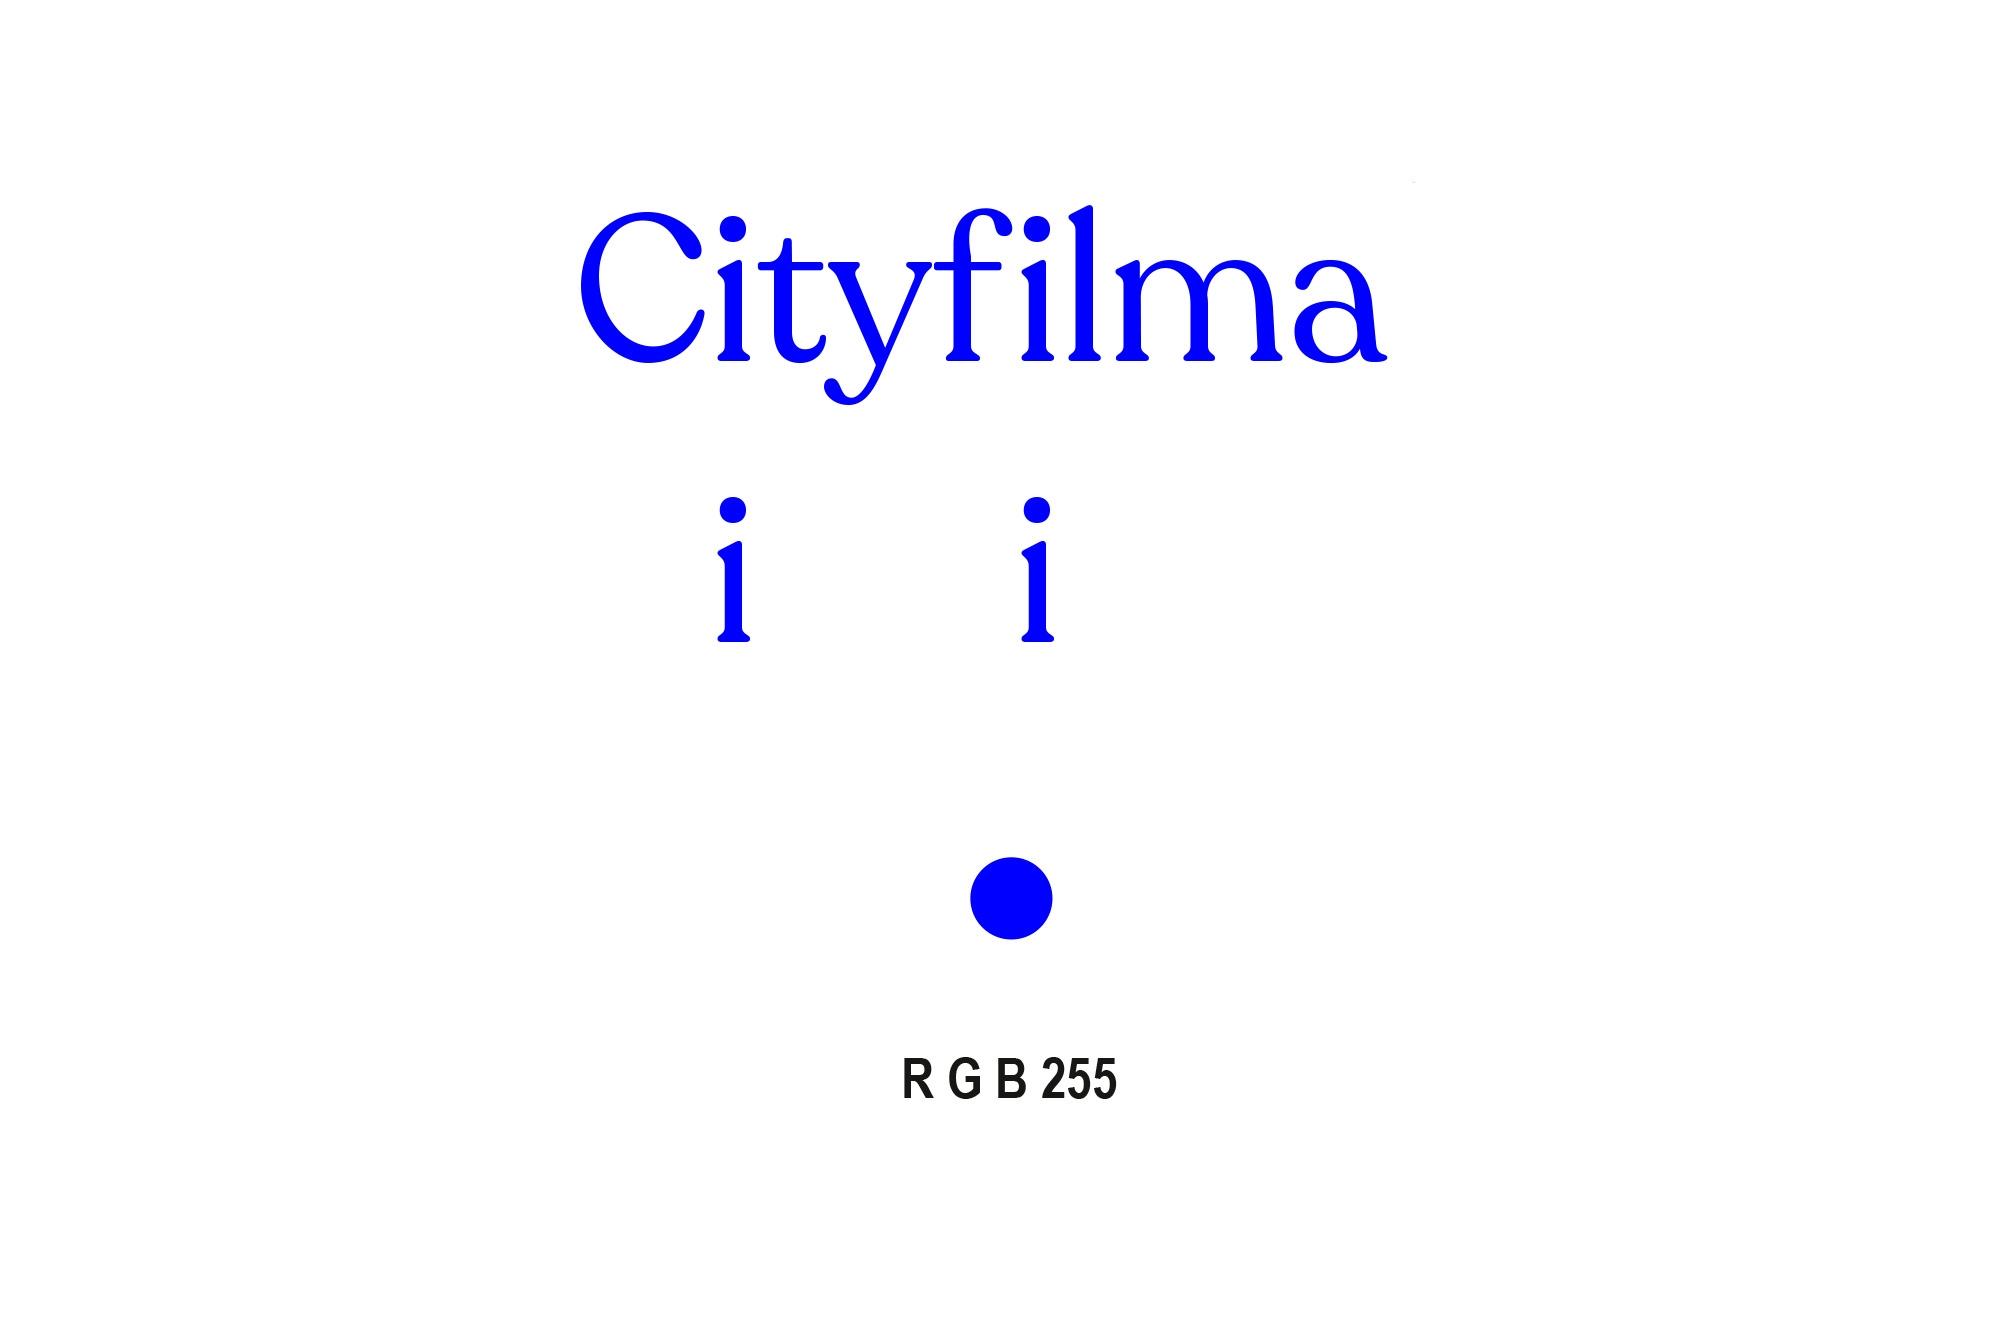 cityfilma_estelalcaraz_04